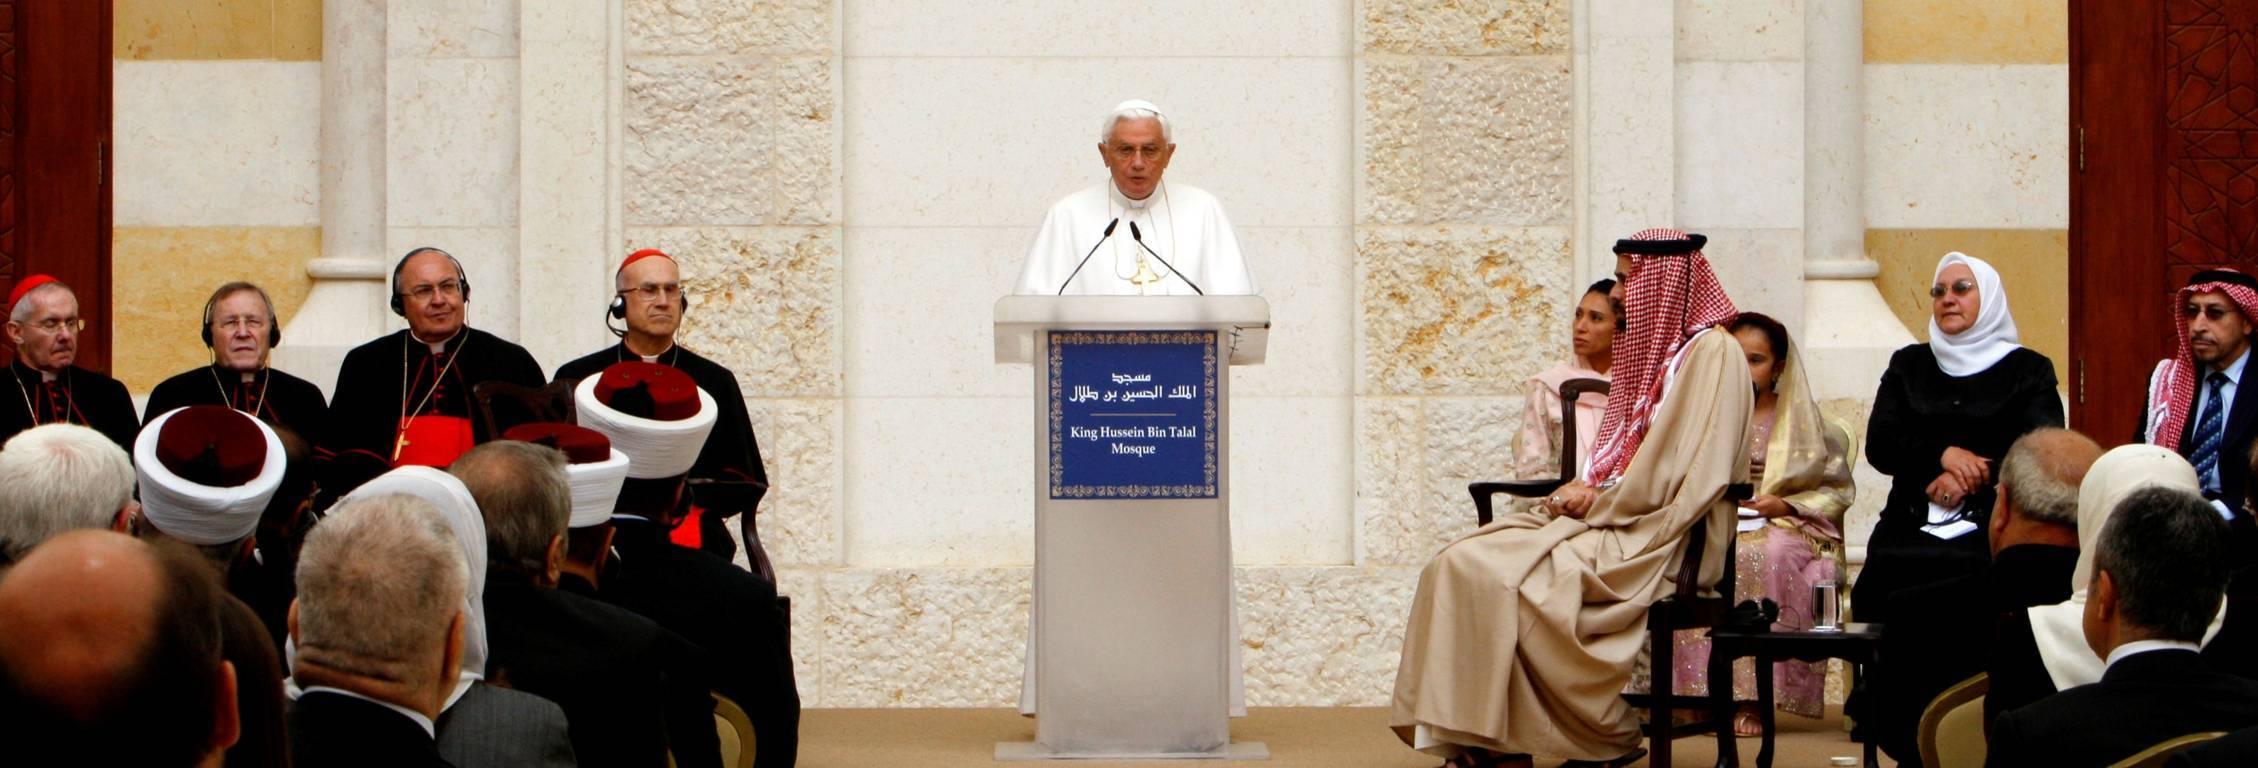 Anti Pope Benedict XVI Al-Hussein Bin Talal Mosque